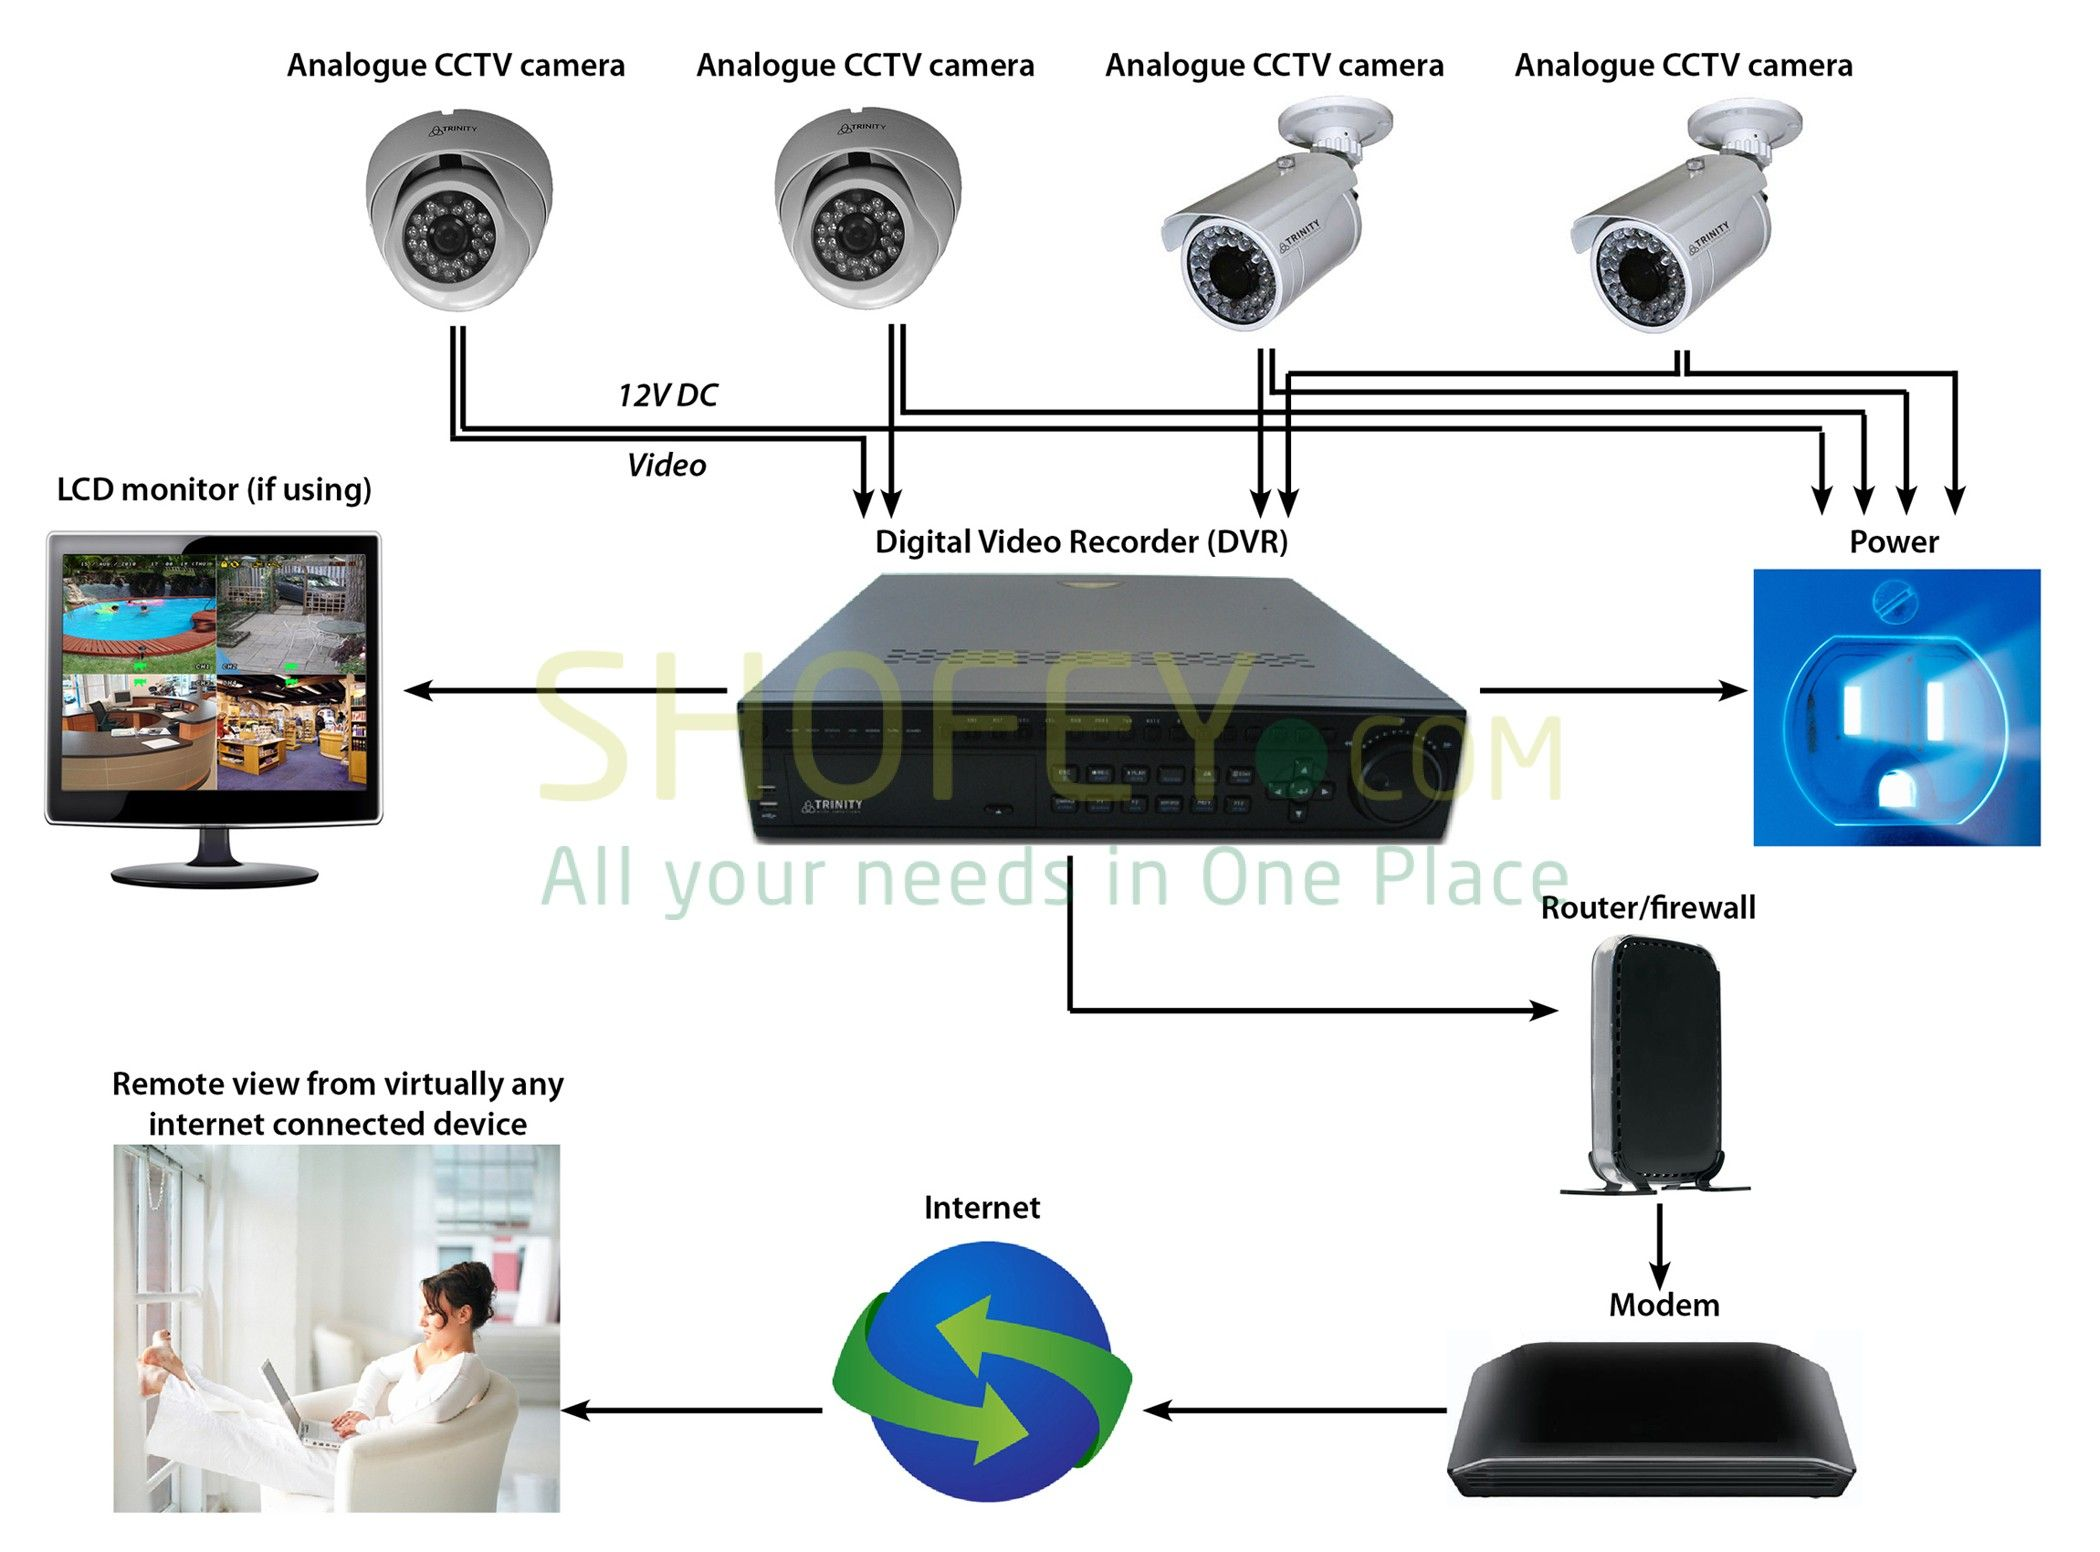 Dubai Cctv Technician Ip Camera Setup Installation 0556789741 Cctv Security Camera Installatio Home Security Systems Wireless Home Security Systems Cctv Camera